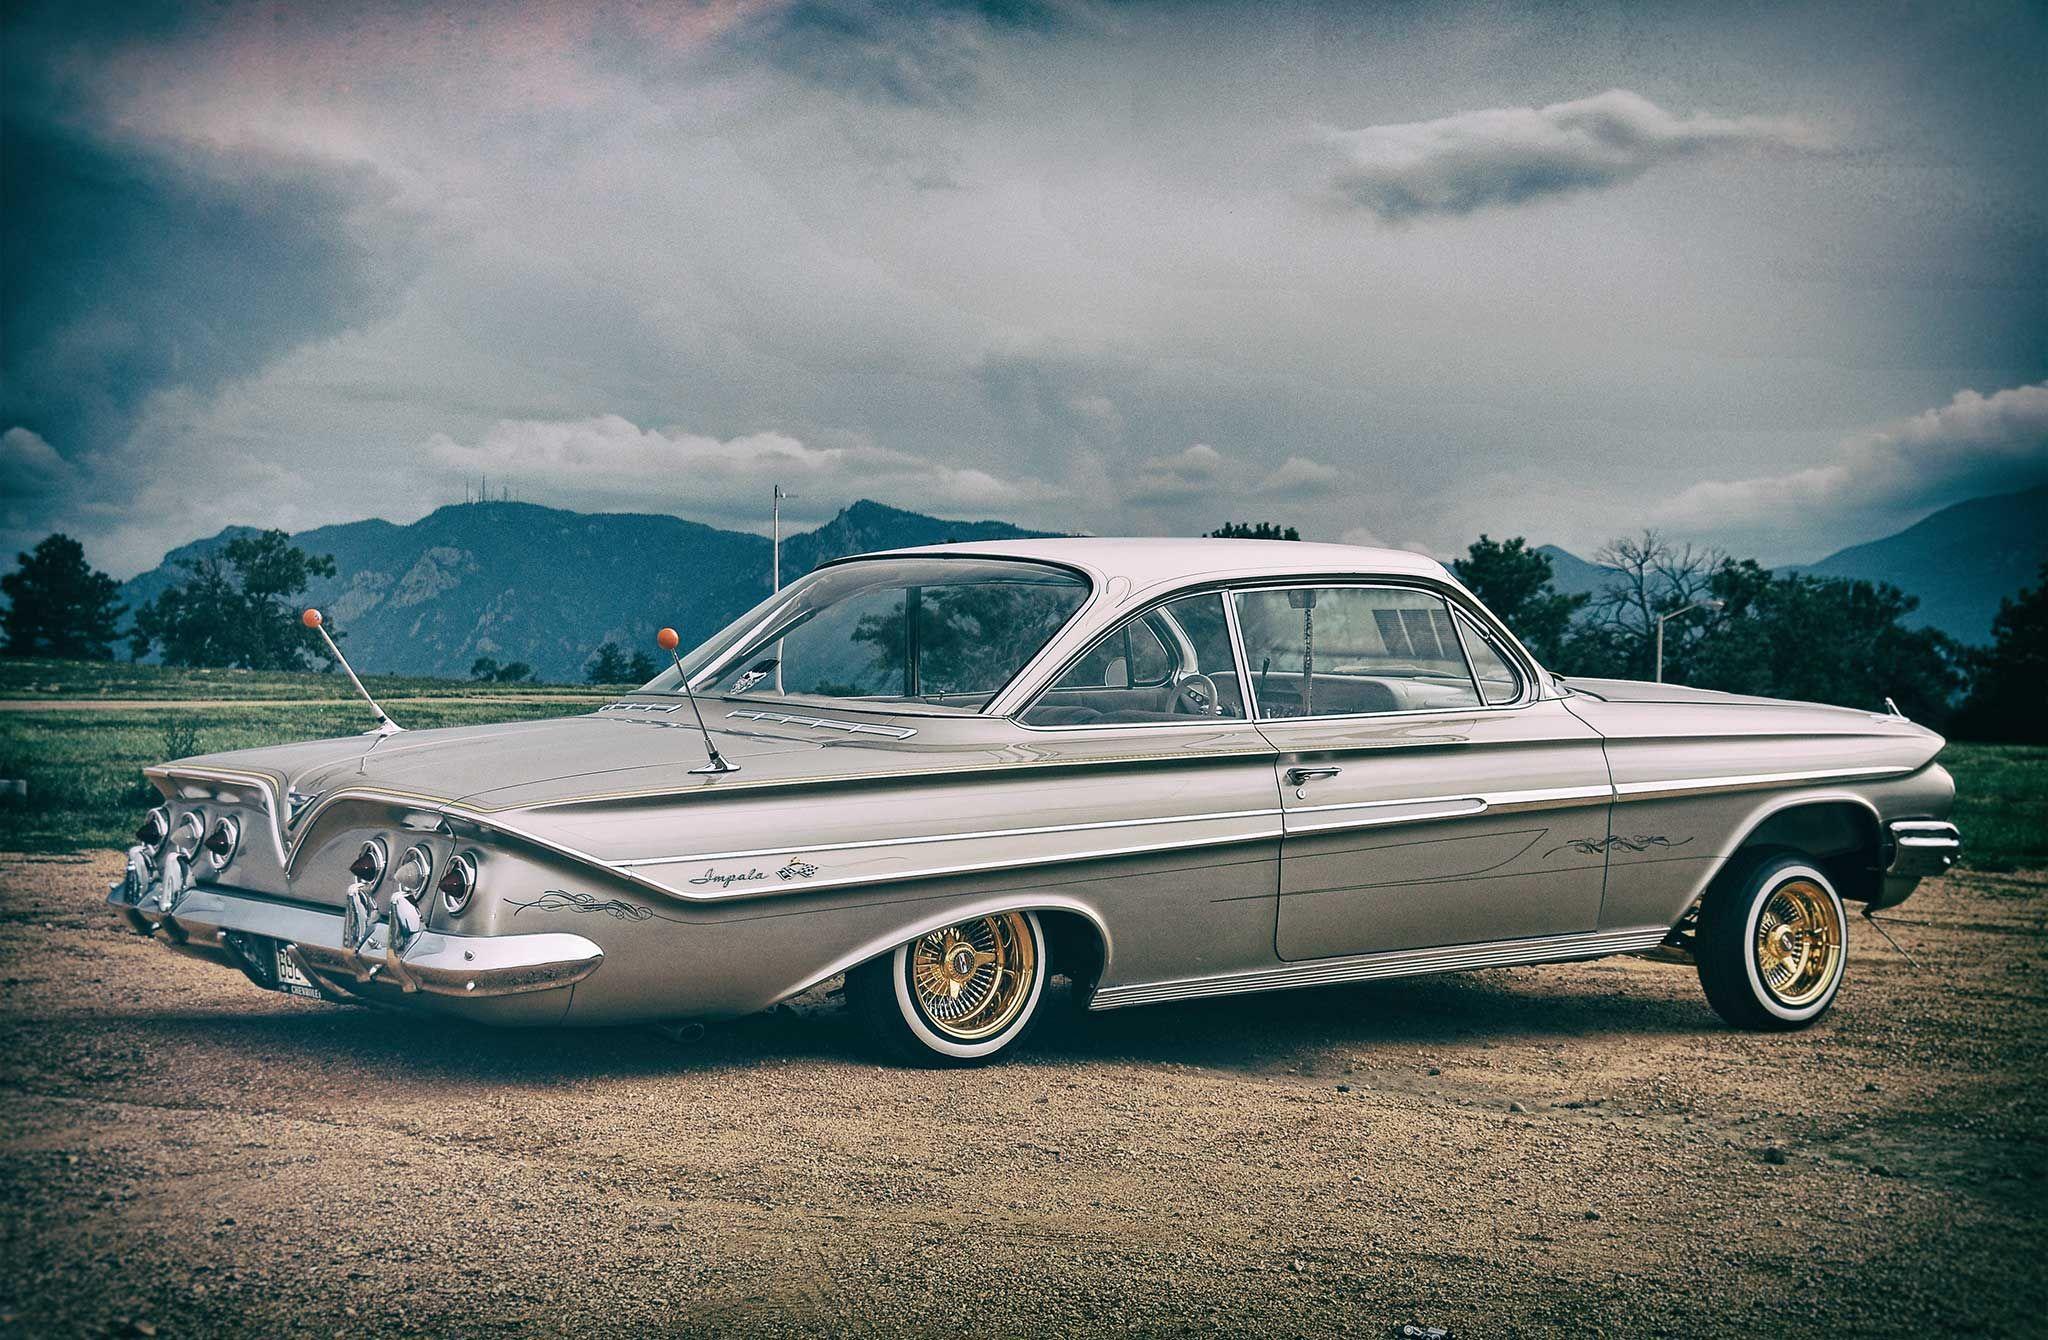 hight resolution of 1961 chevrolet impala precious metals found a 61 impala pot of gold in colorado